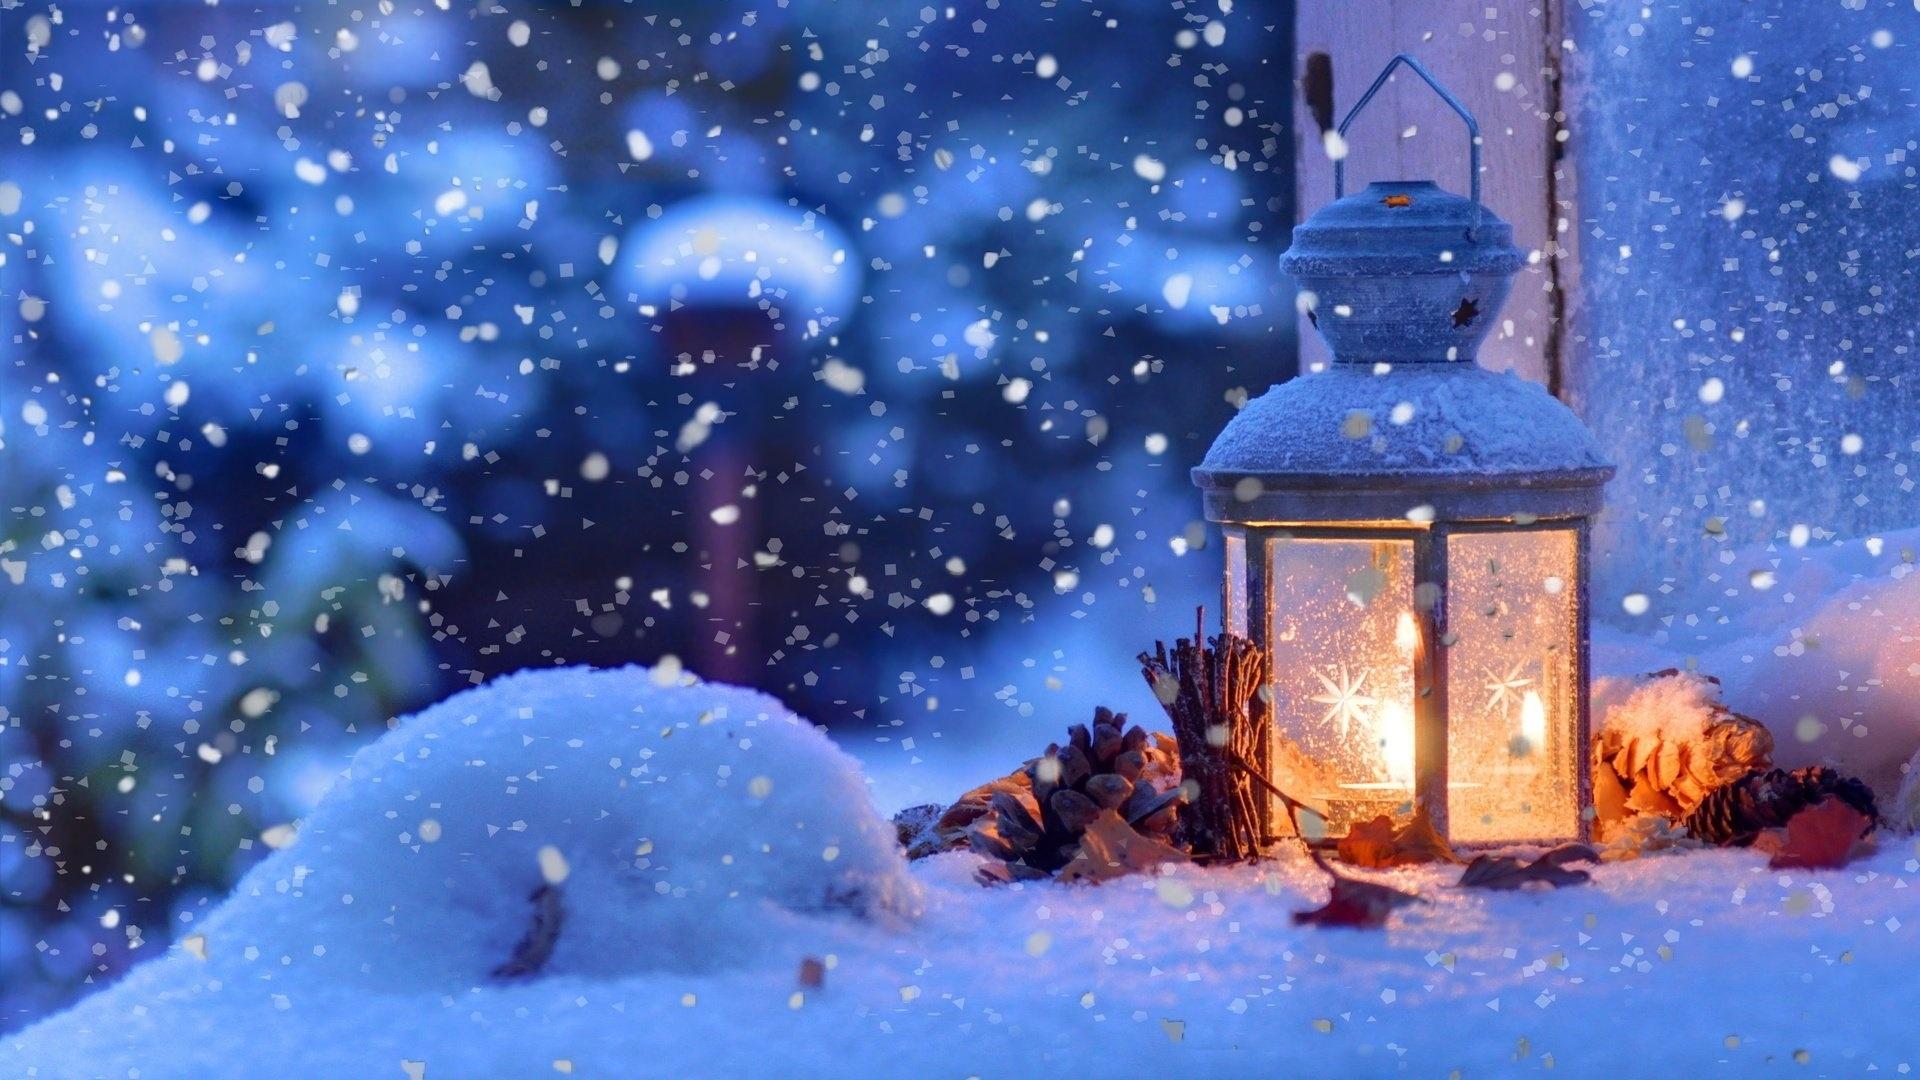 Winter New Year's Evening Desktop Wallpaper